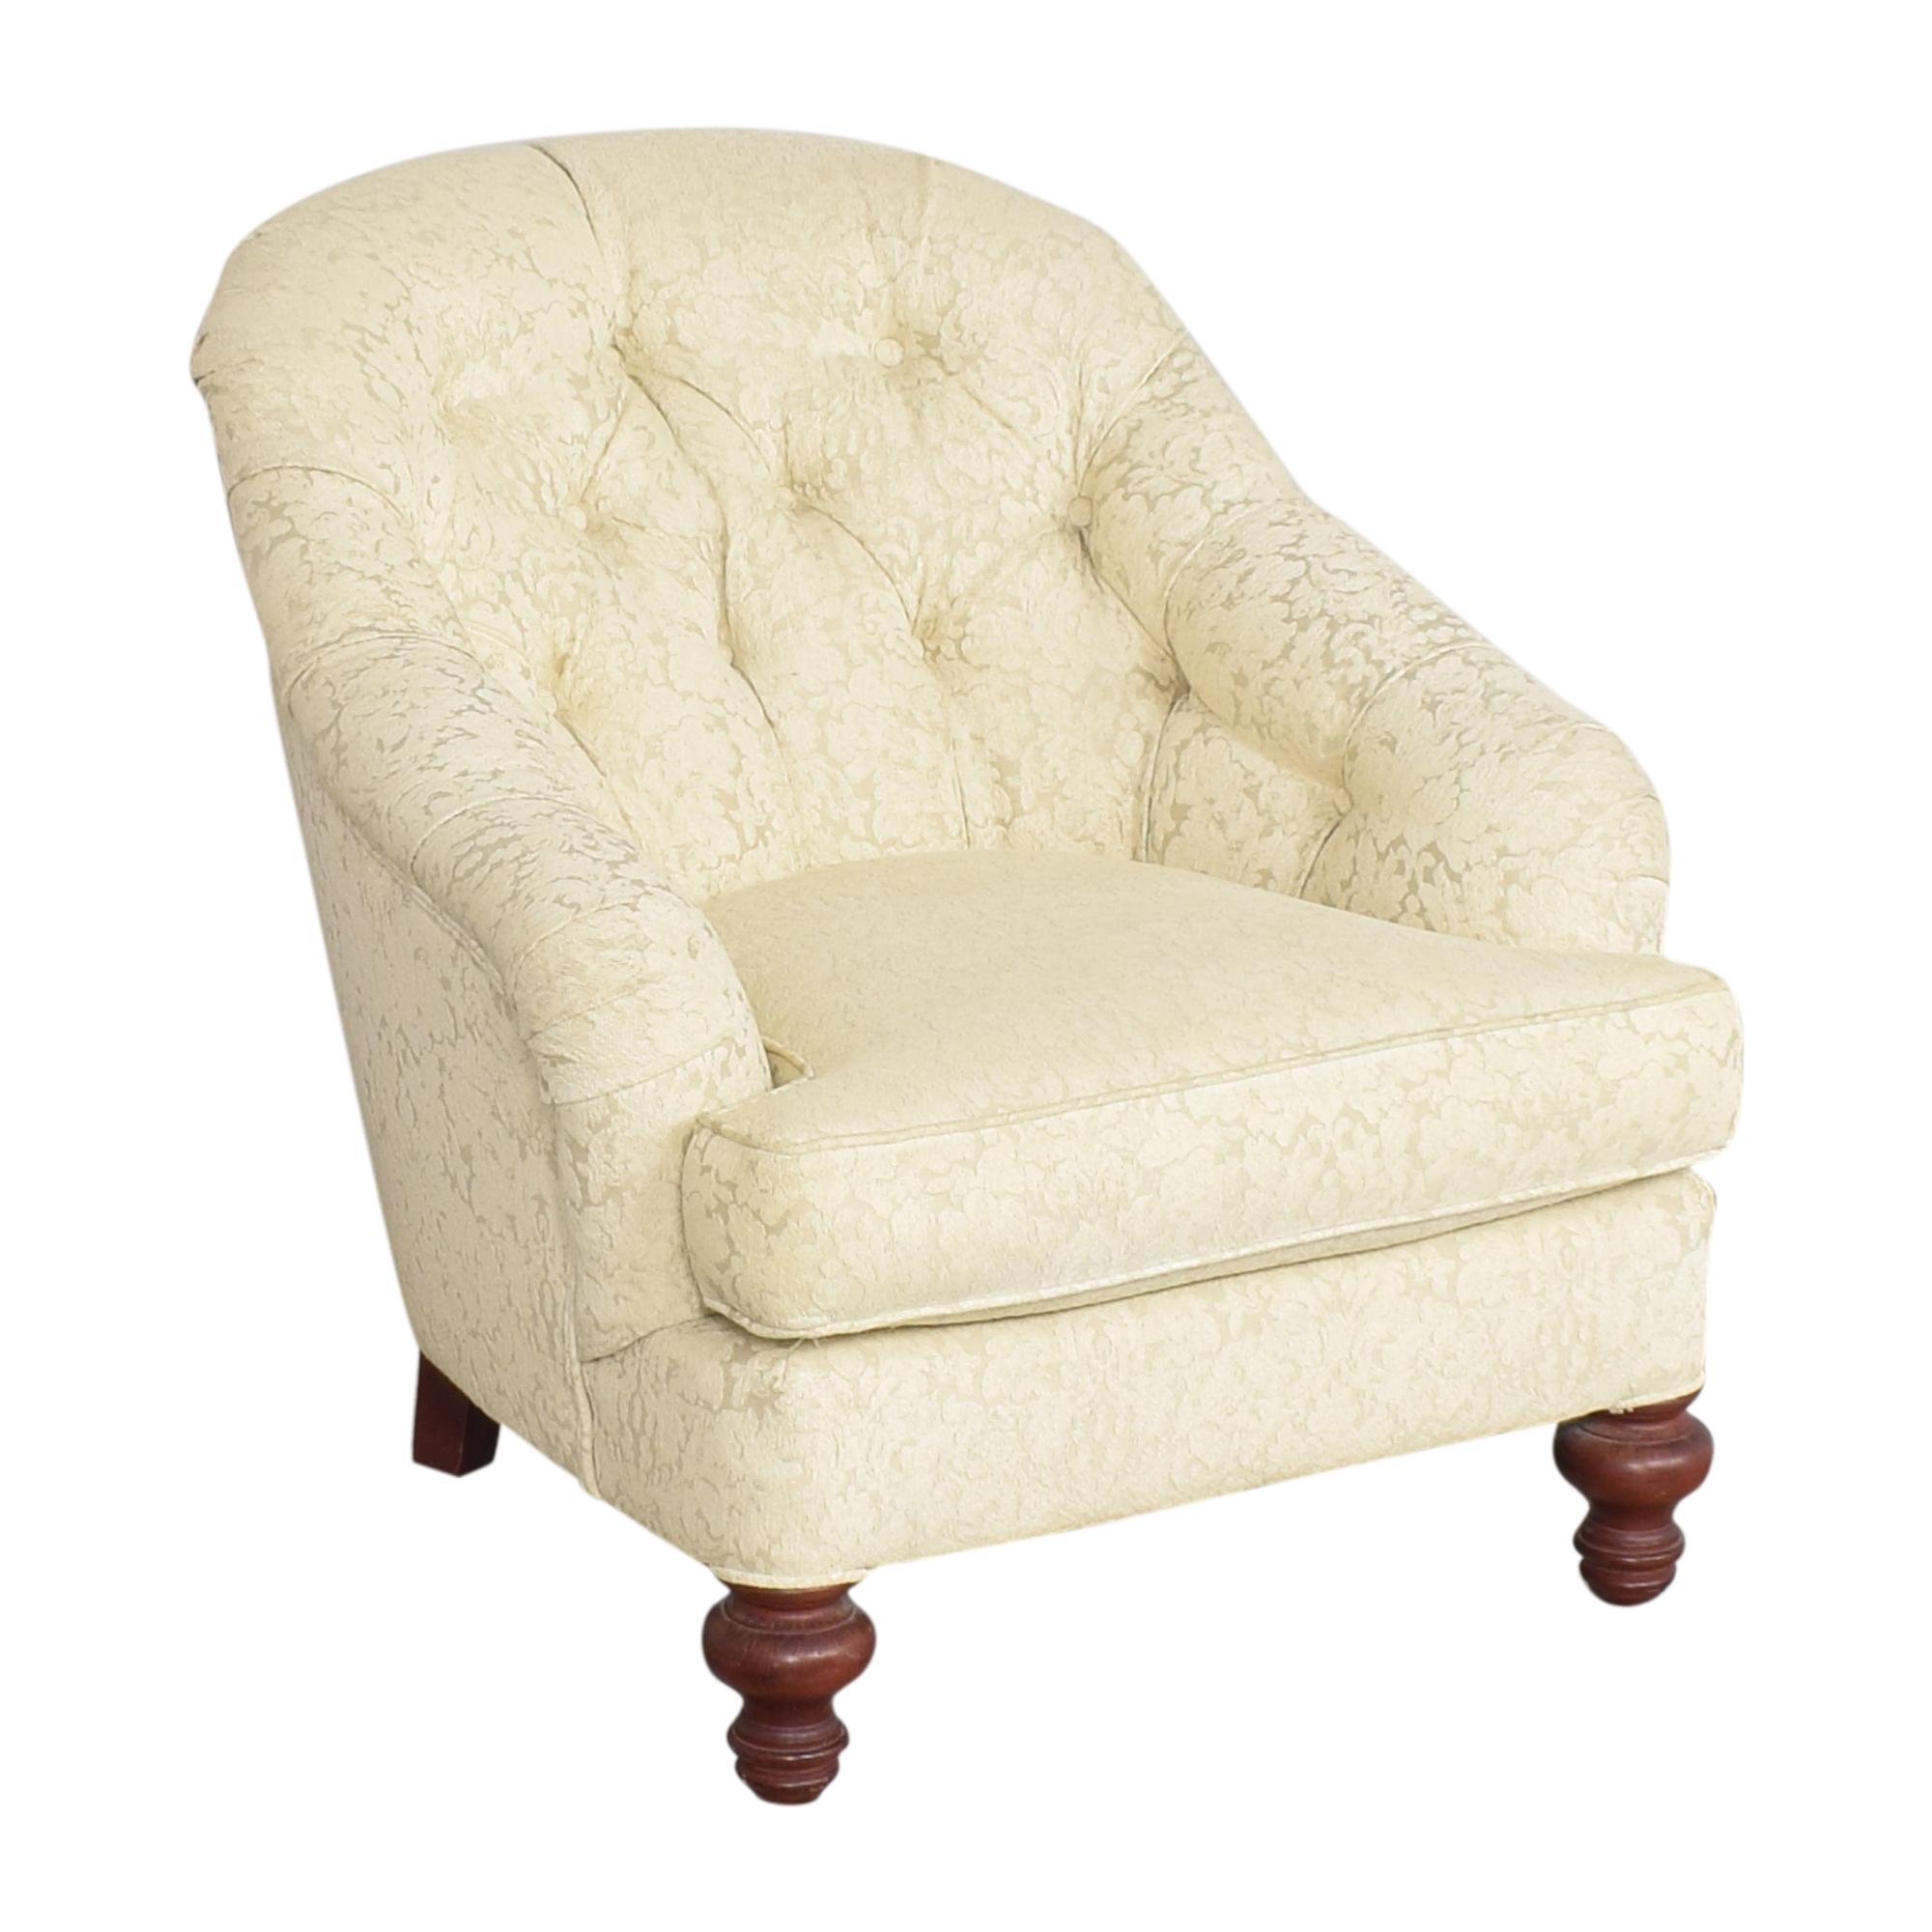 ABC Carpet & Home ABC Carpet & Home Mitchell Gold Accent Chair pa